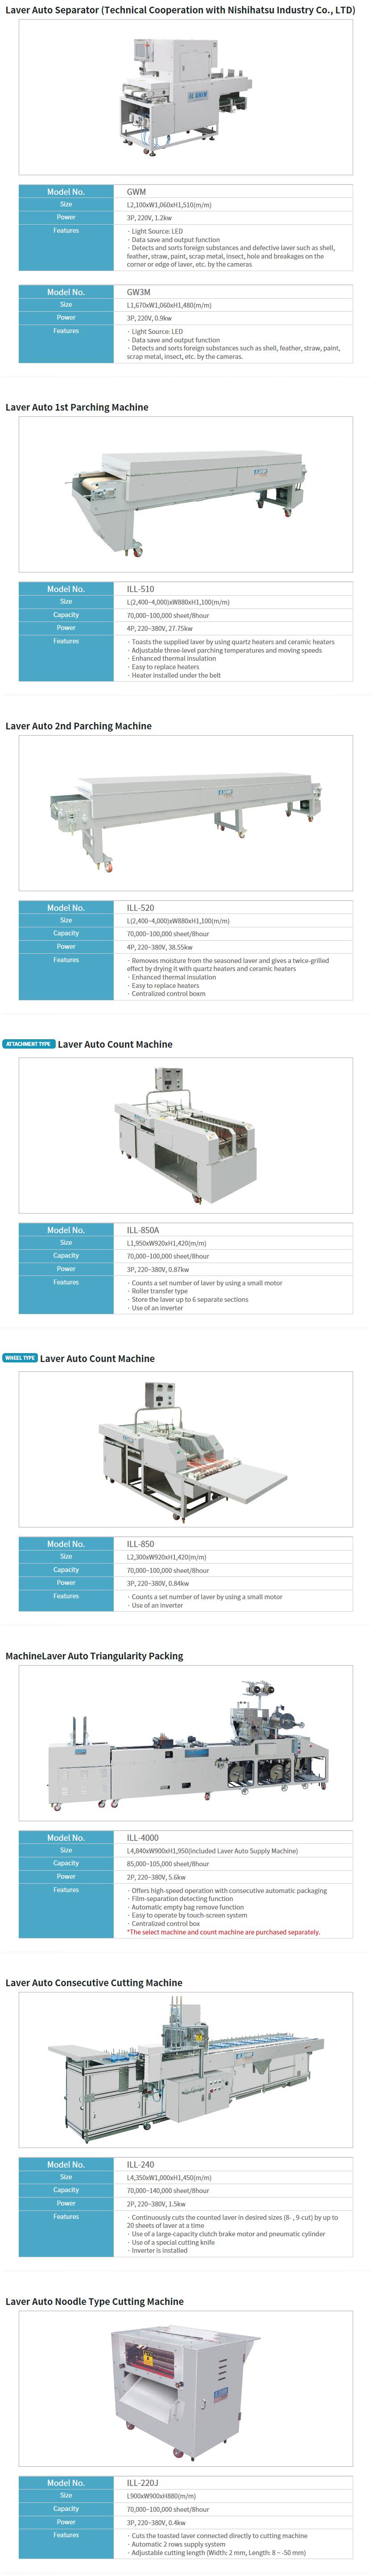 IL-SHIN MACHINE Other Machines